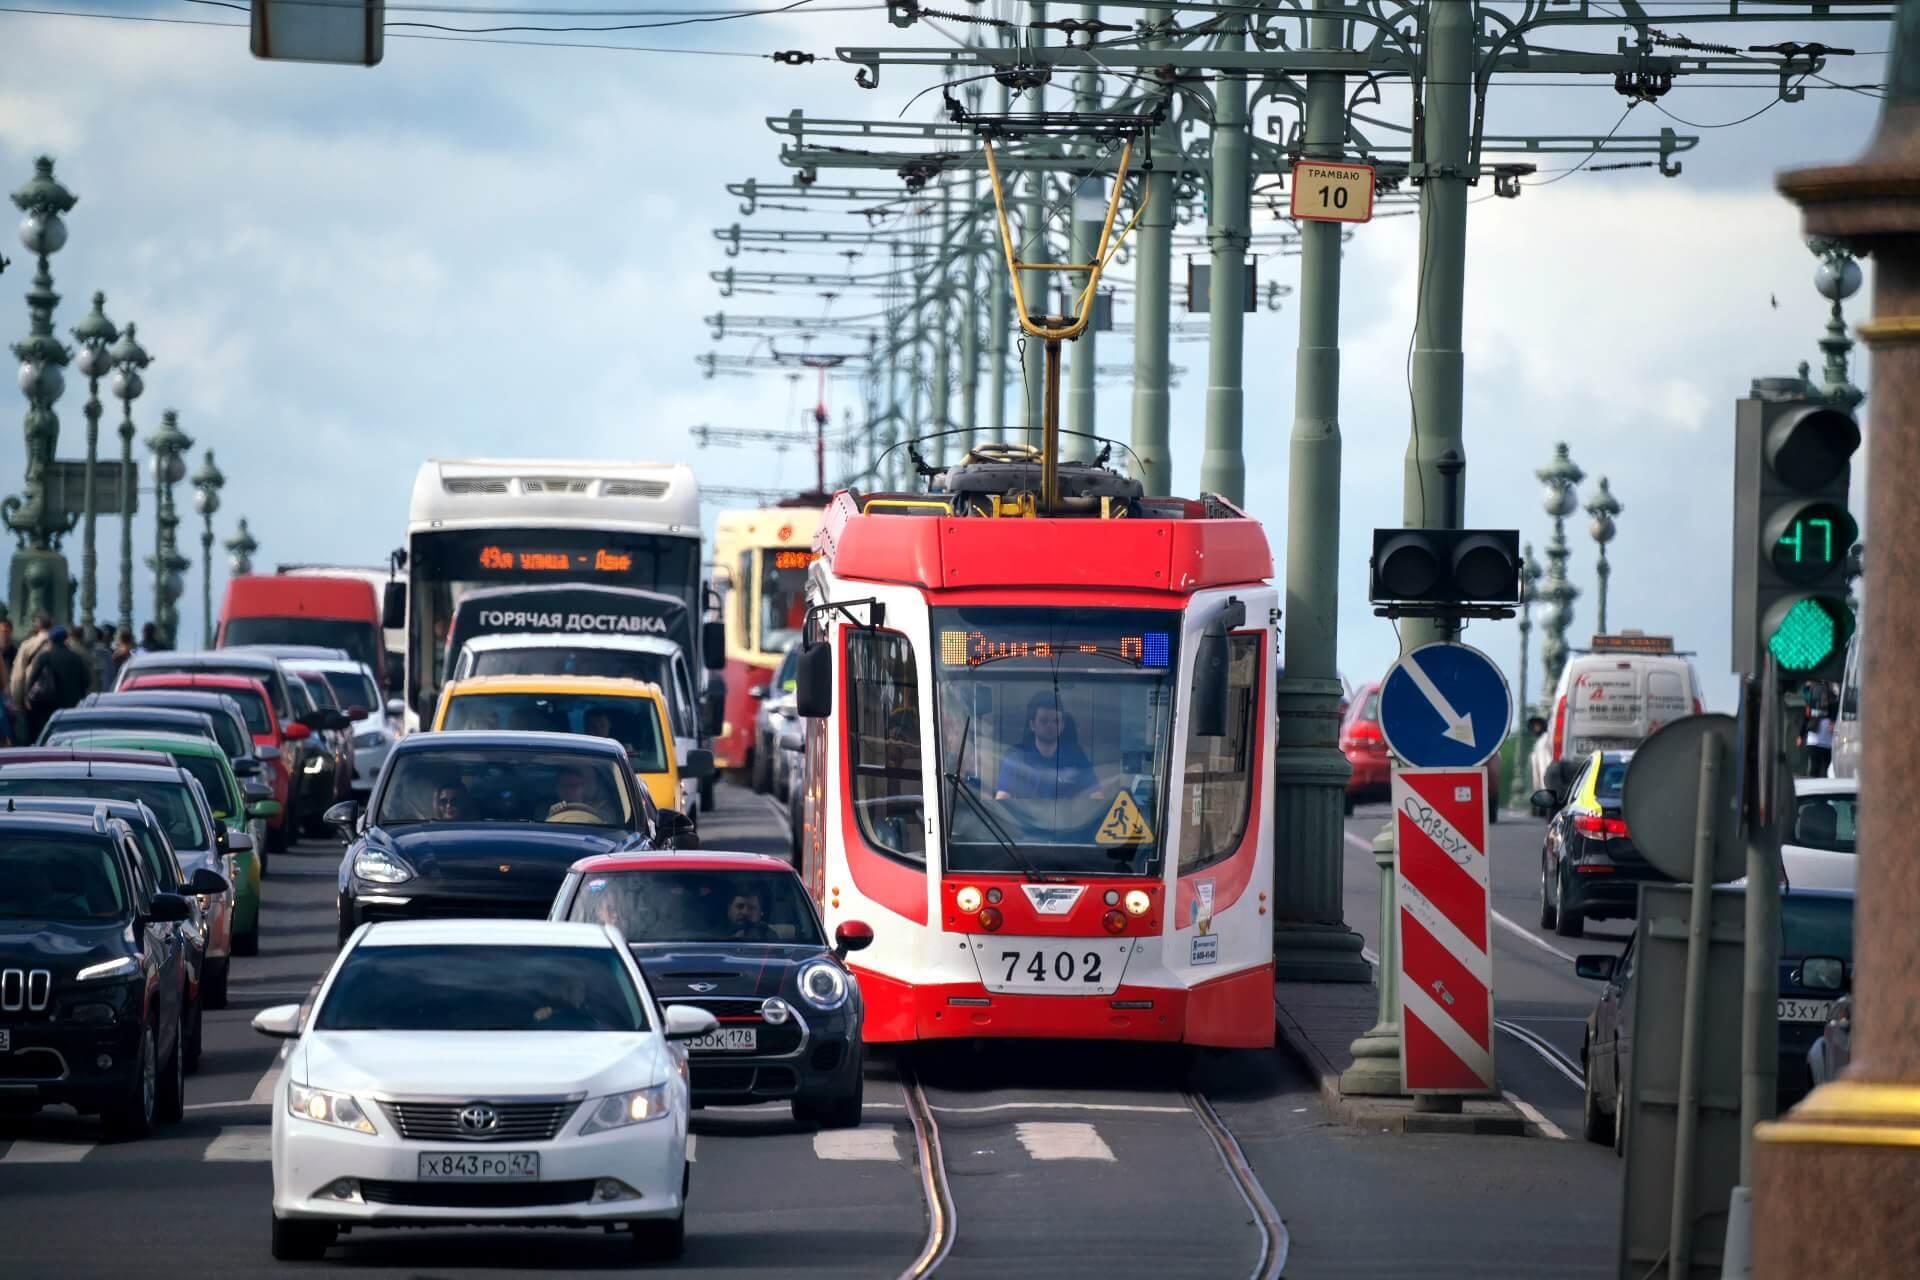 Новости Днепра про Завтра транспорт в Днепре изменит график движения: планируйте маршрут